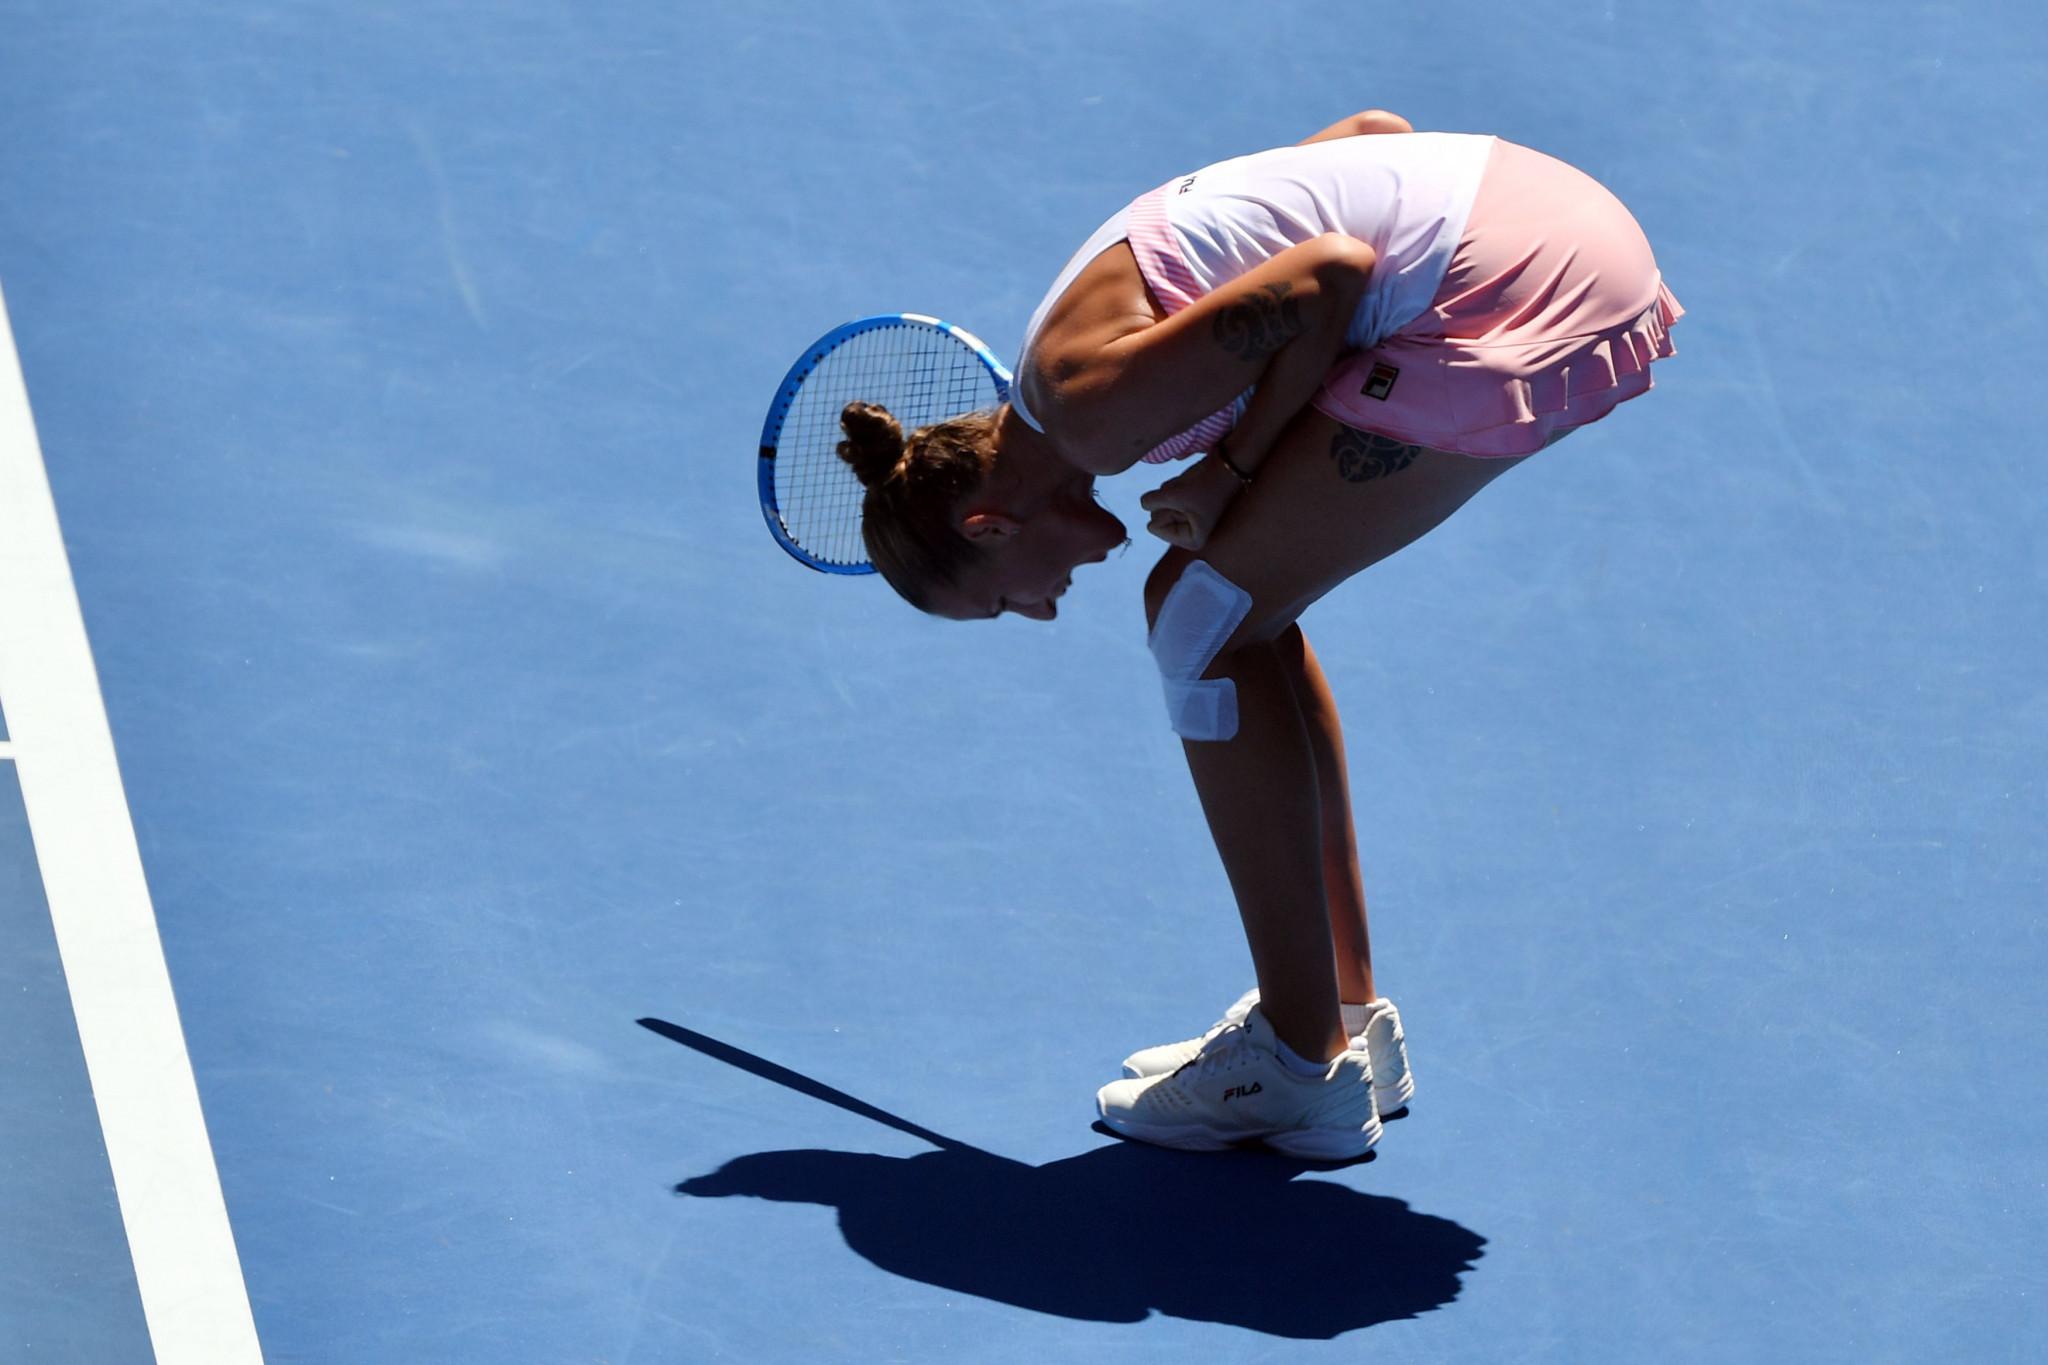 Plíšková reaches semi-finals with comeback win over Williams at Australian Open